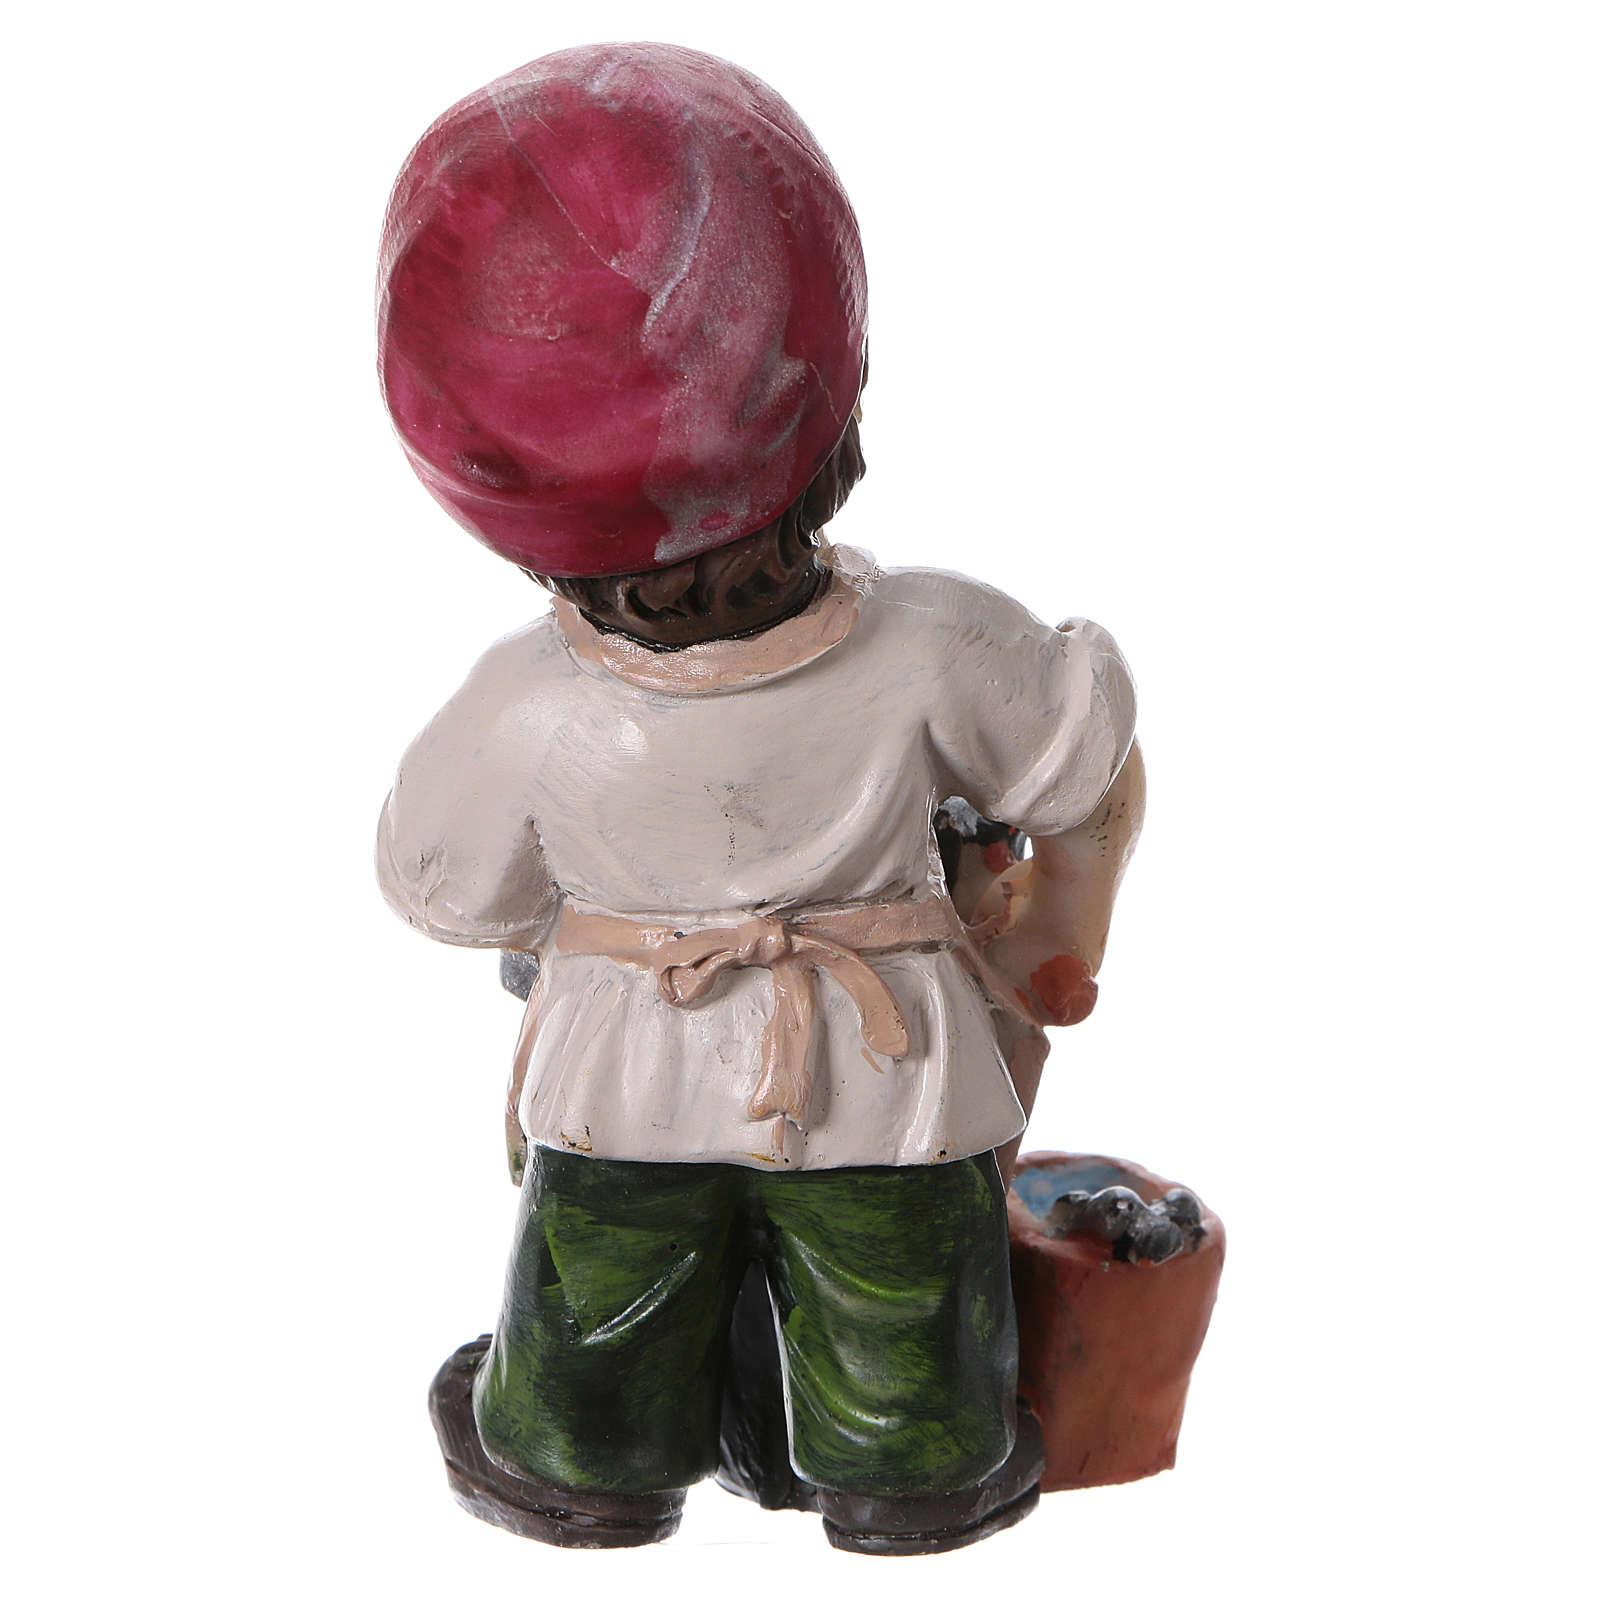 Statuina fabbro linea bambino 9 cm 3